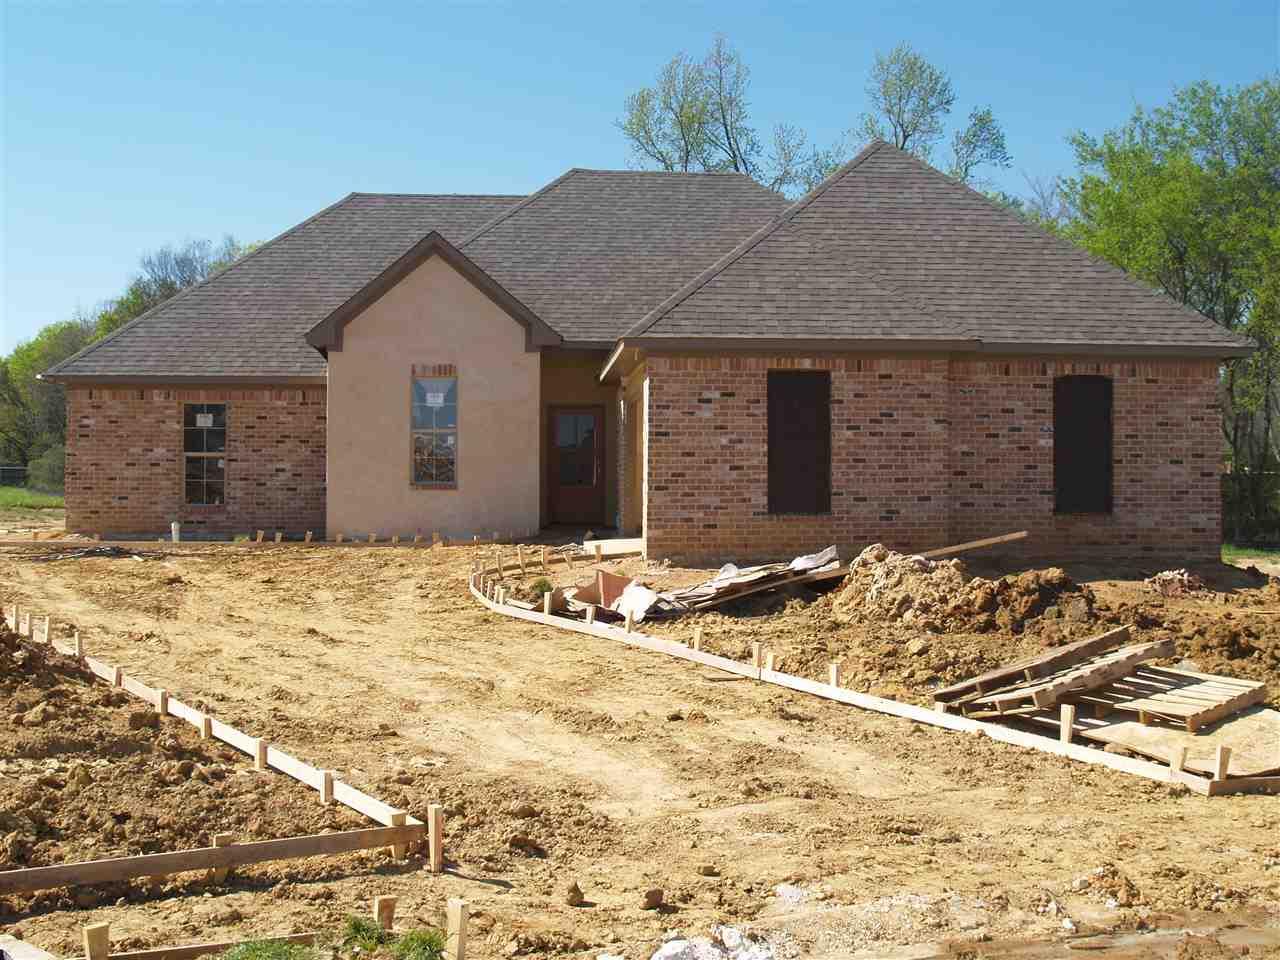 Real Estate for Sale, ListingId: 36828286, Madison,MS39110